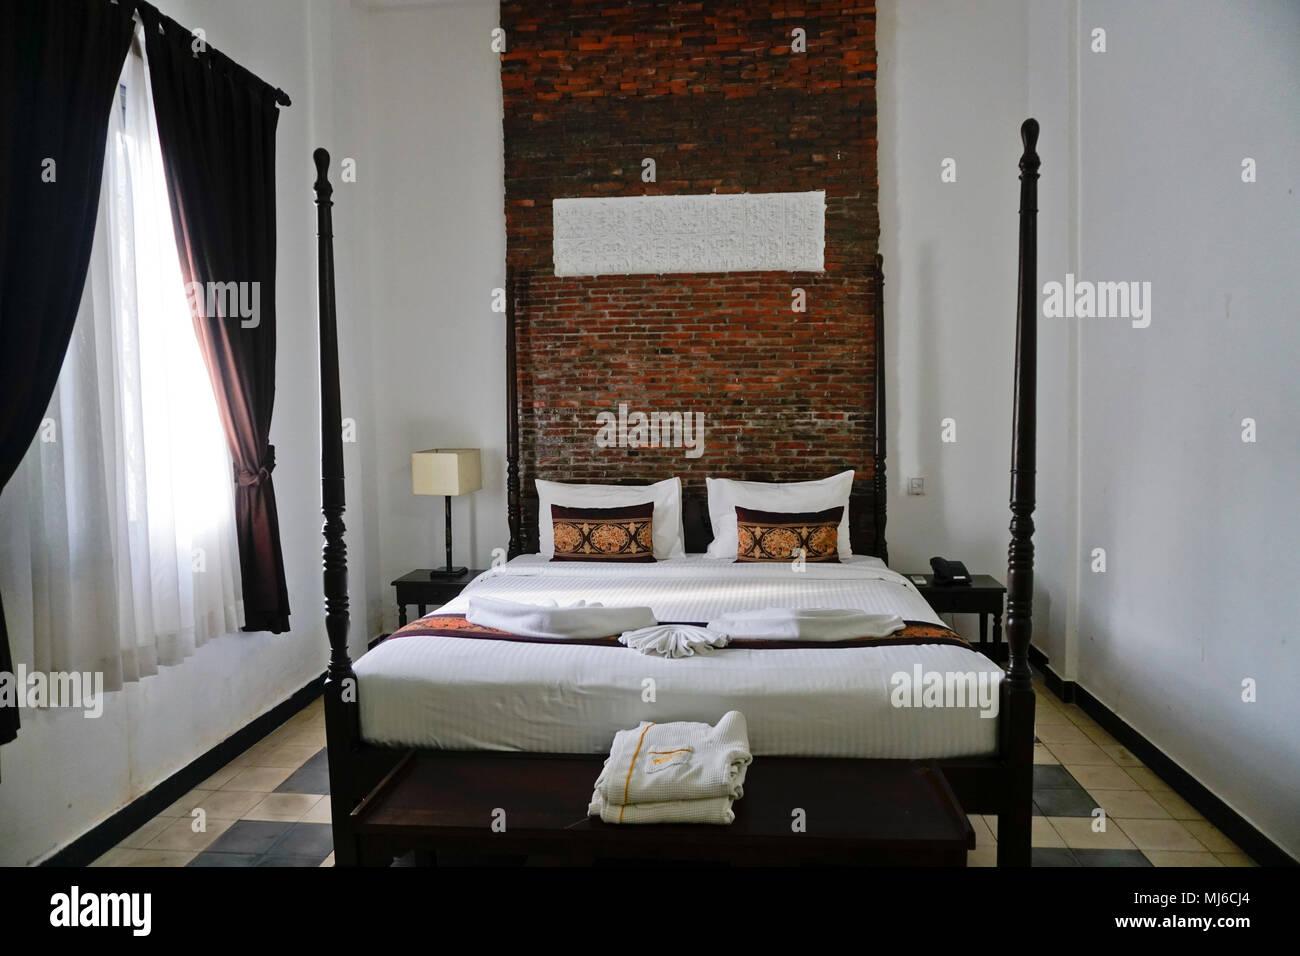 Schlafzimmer mit Himmelbett Stockfoto, Bild: 183309116 - Alamy